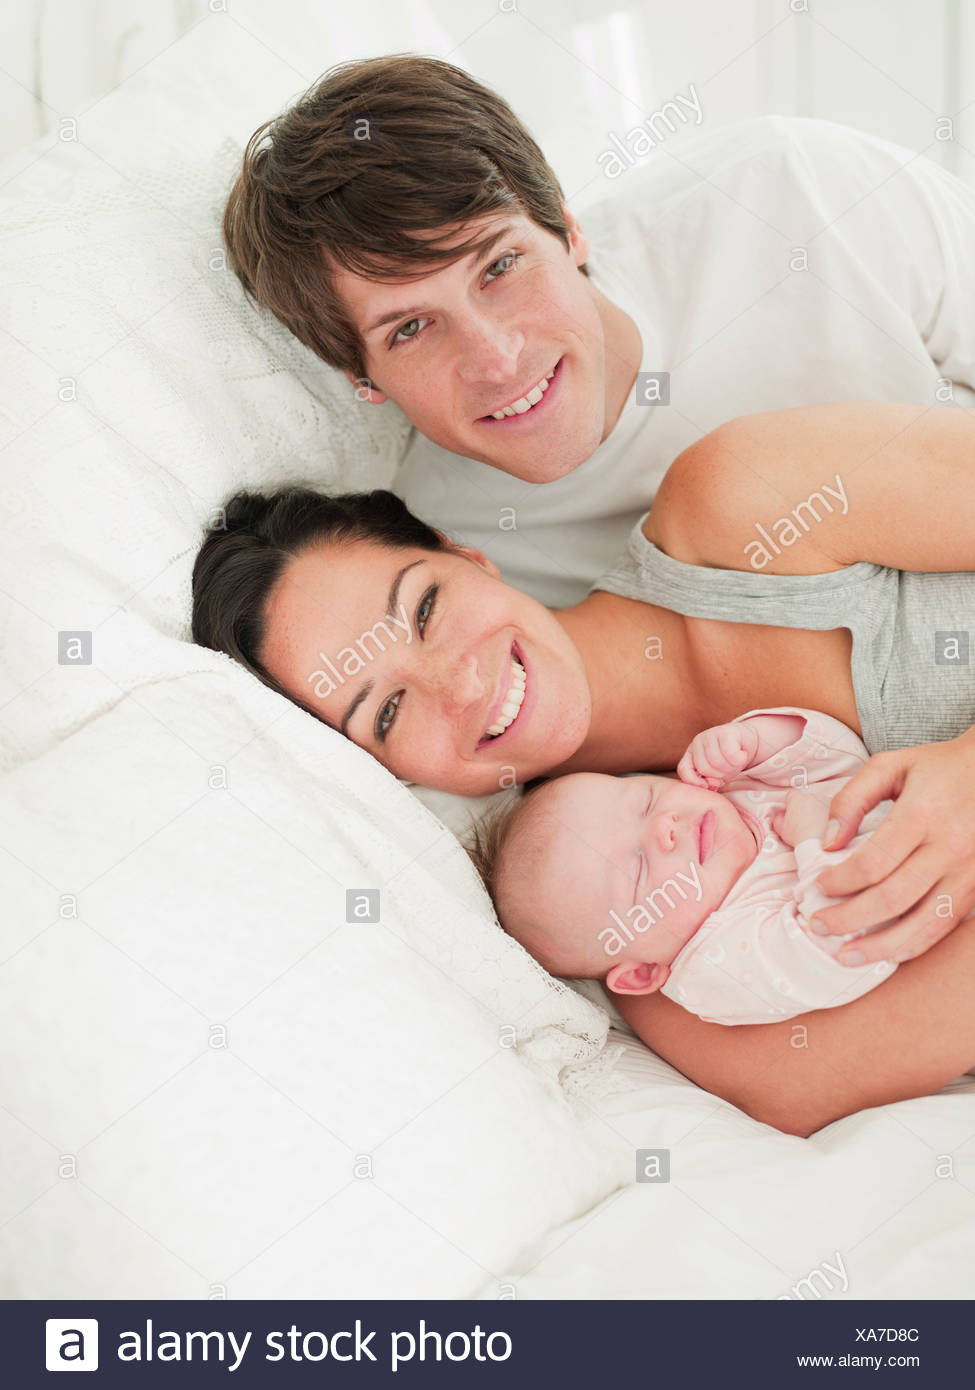 Baby Sleep Parents Bedroom: Father Asleep In Bed Stock Photos & Father Asleep In Bed